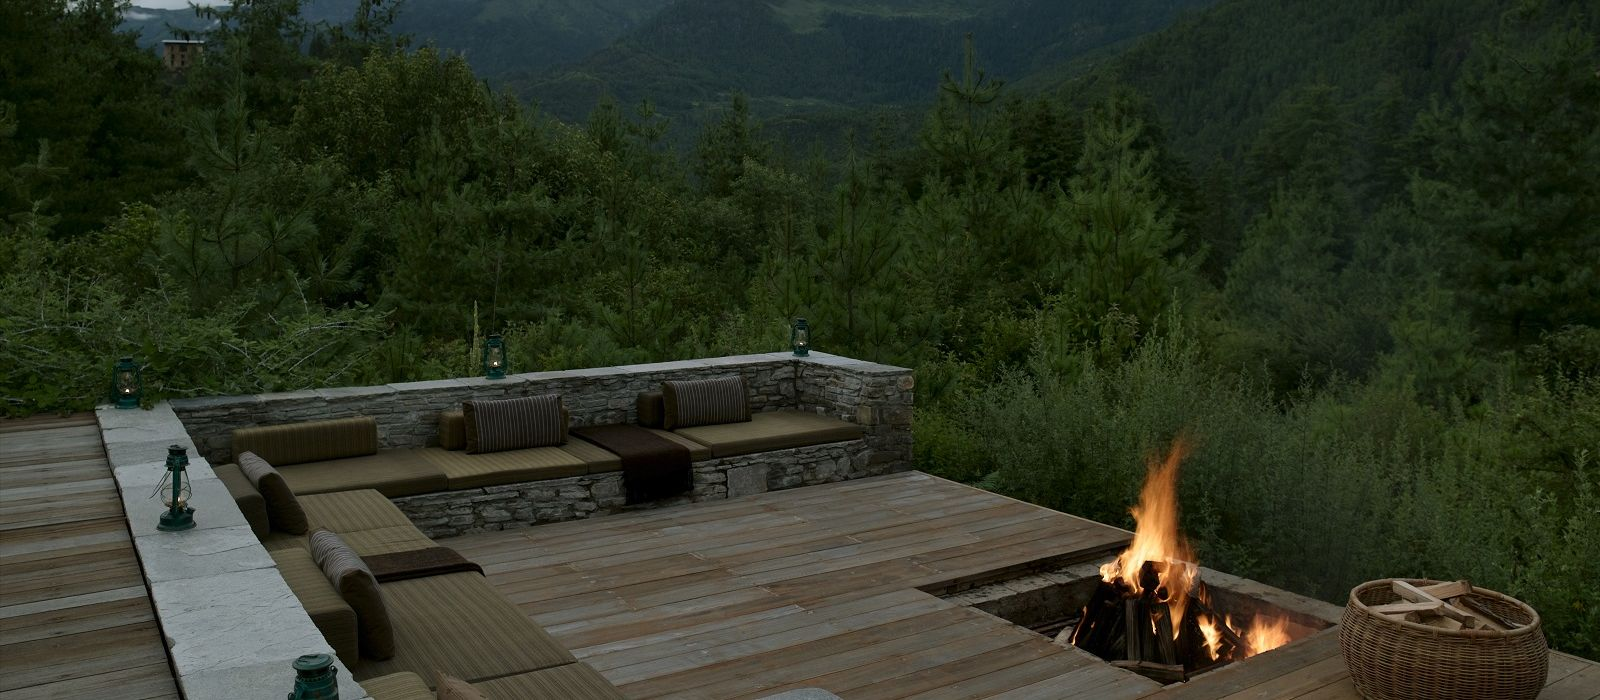 Amankora Exklusivangebot: Luxuriöses Bhutan Urlaub 2